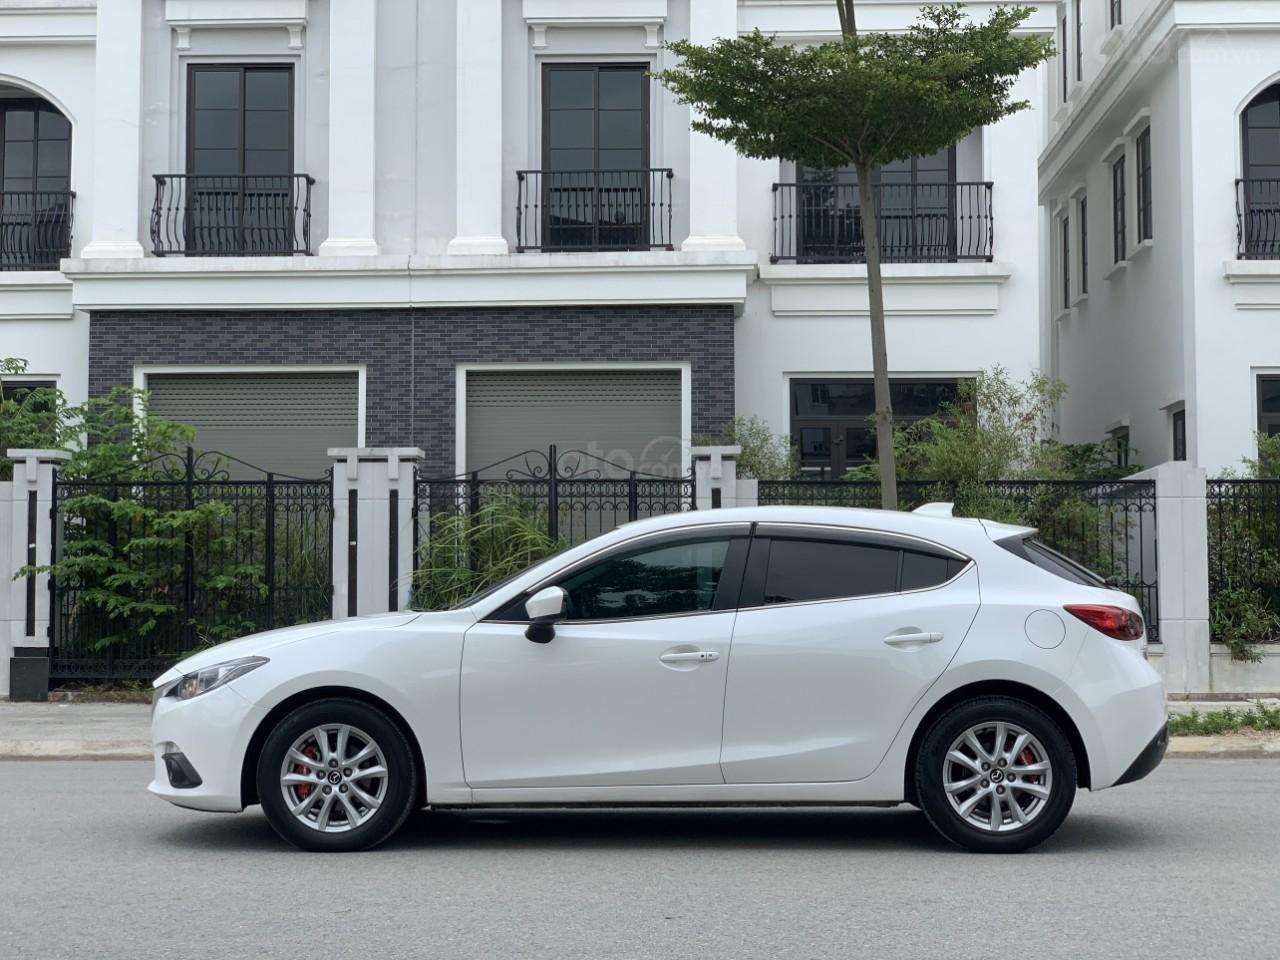 Bán Mazda 3 HB 1.5AT sản xuất 2015 (2)